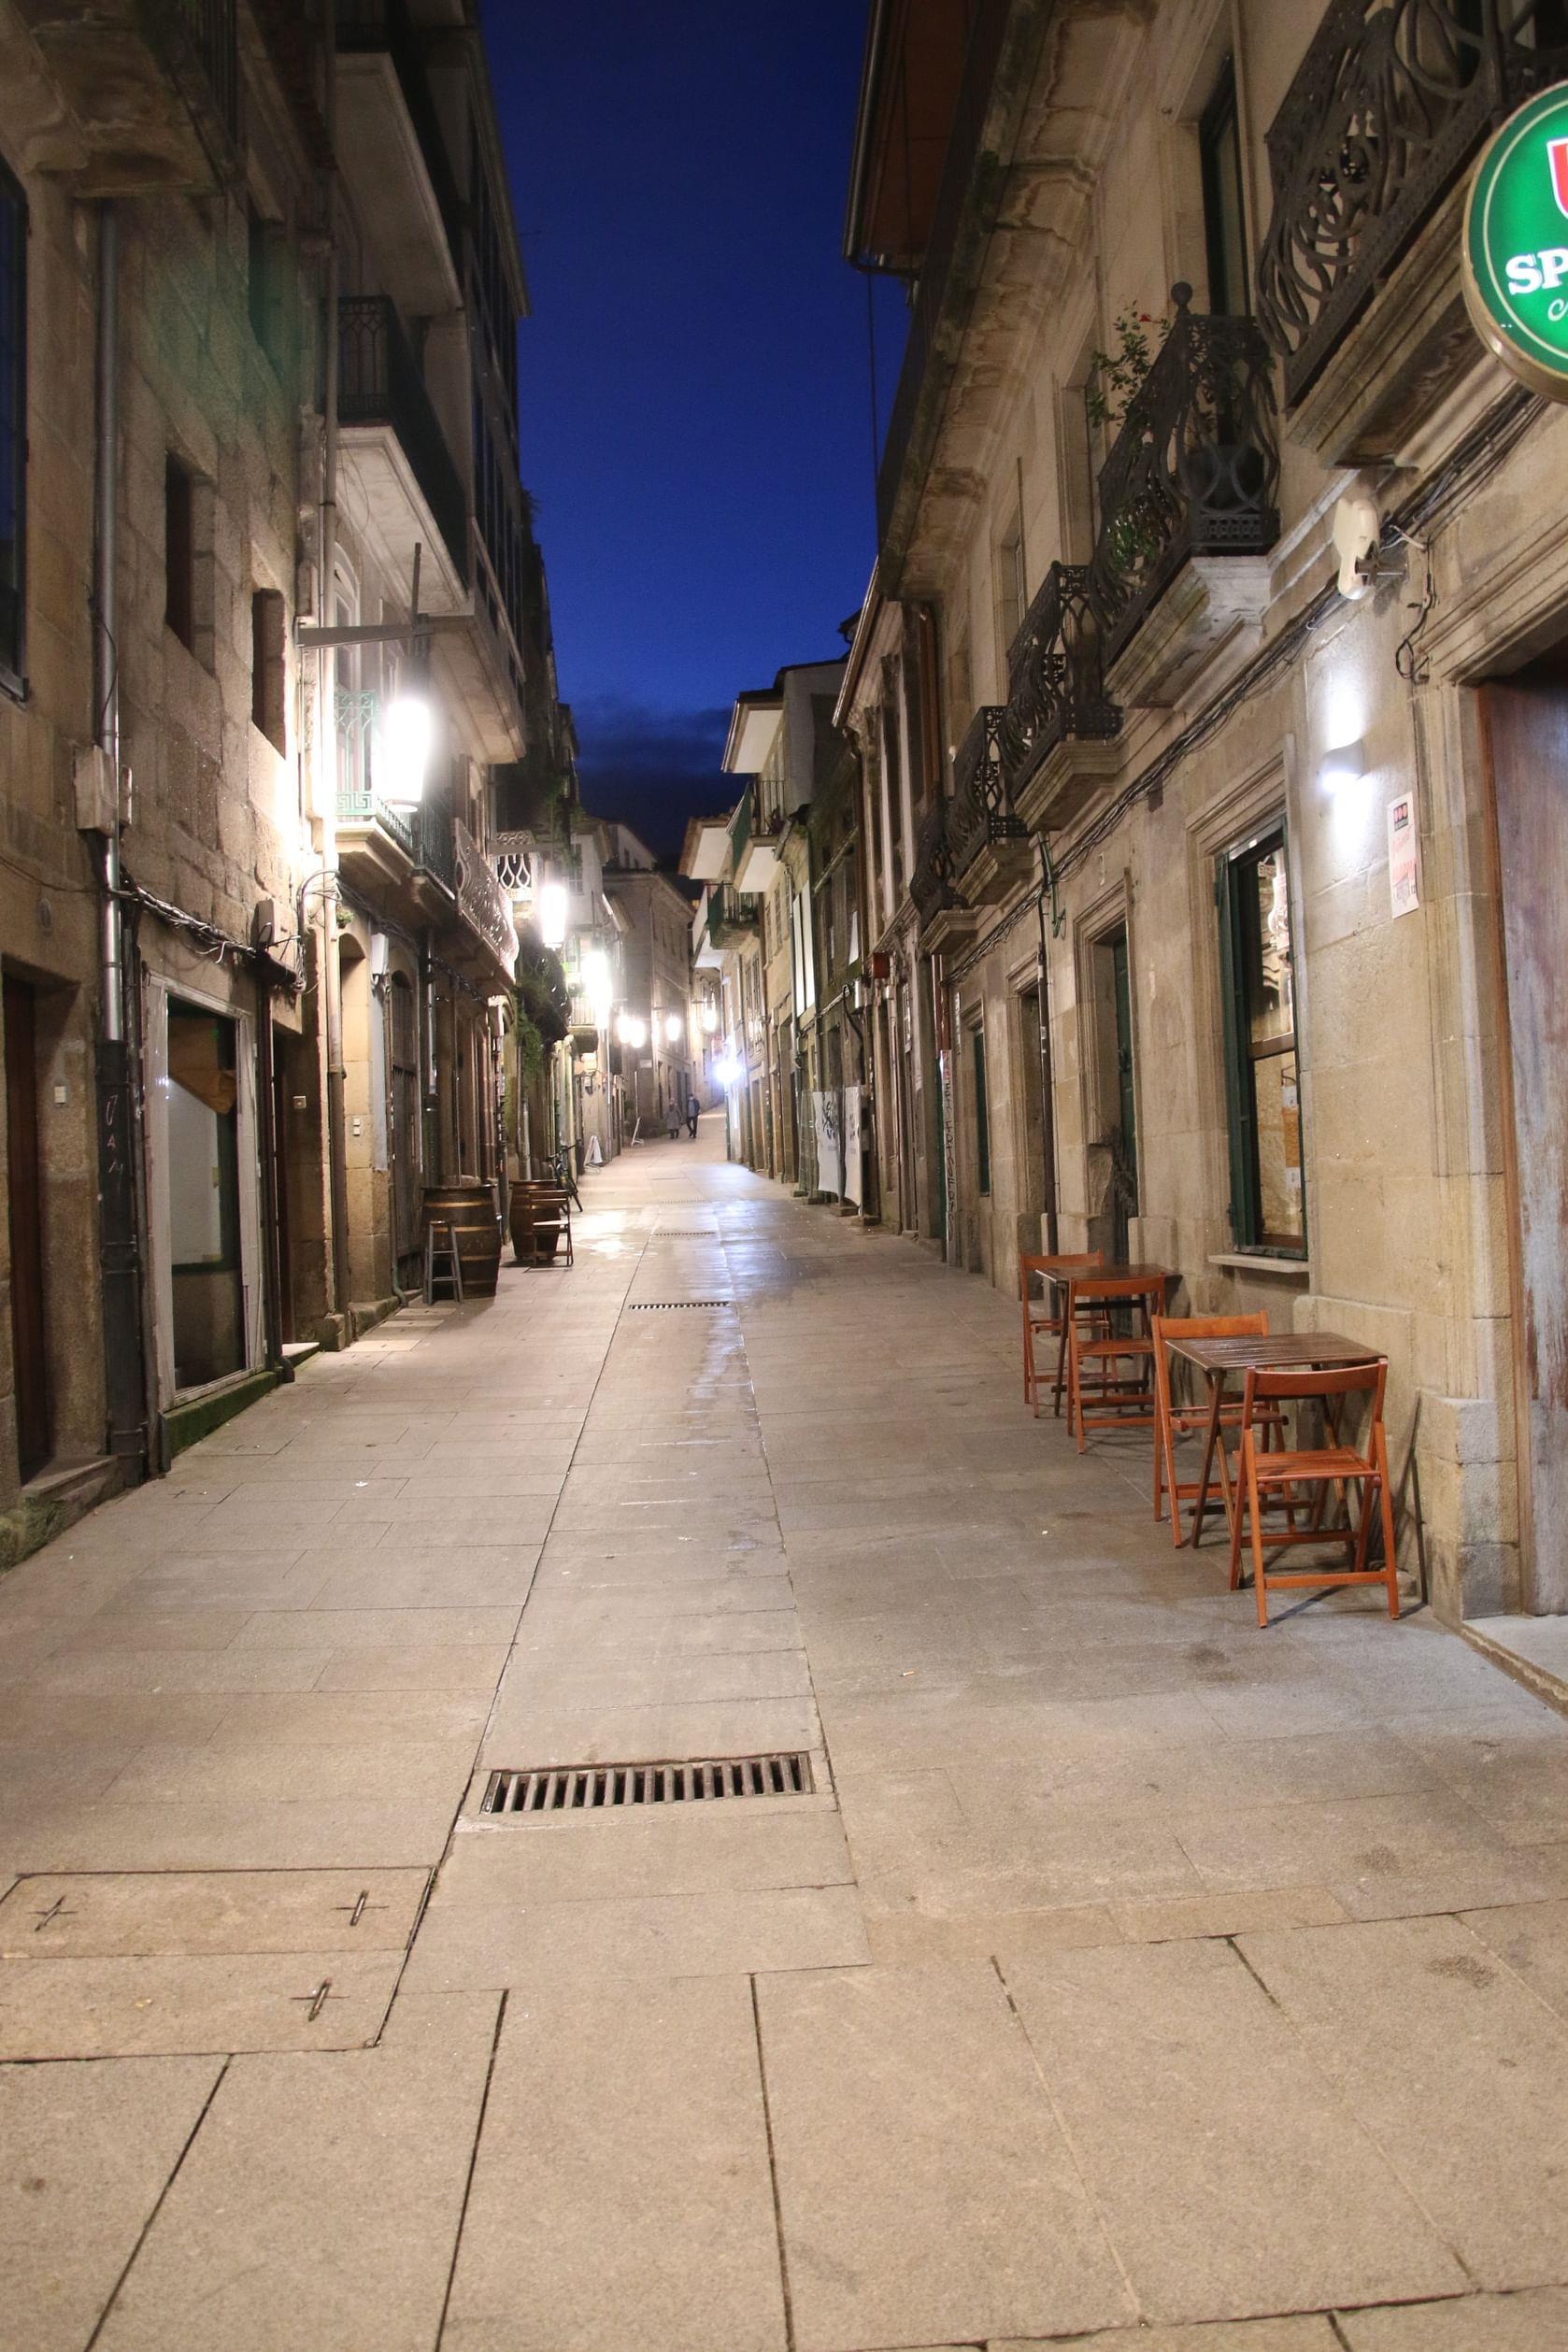 Free-Tour-Nocturno-Cristianos-y-Paganos-Pontevedra-4